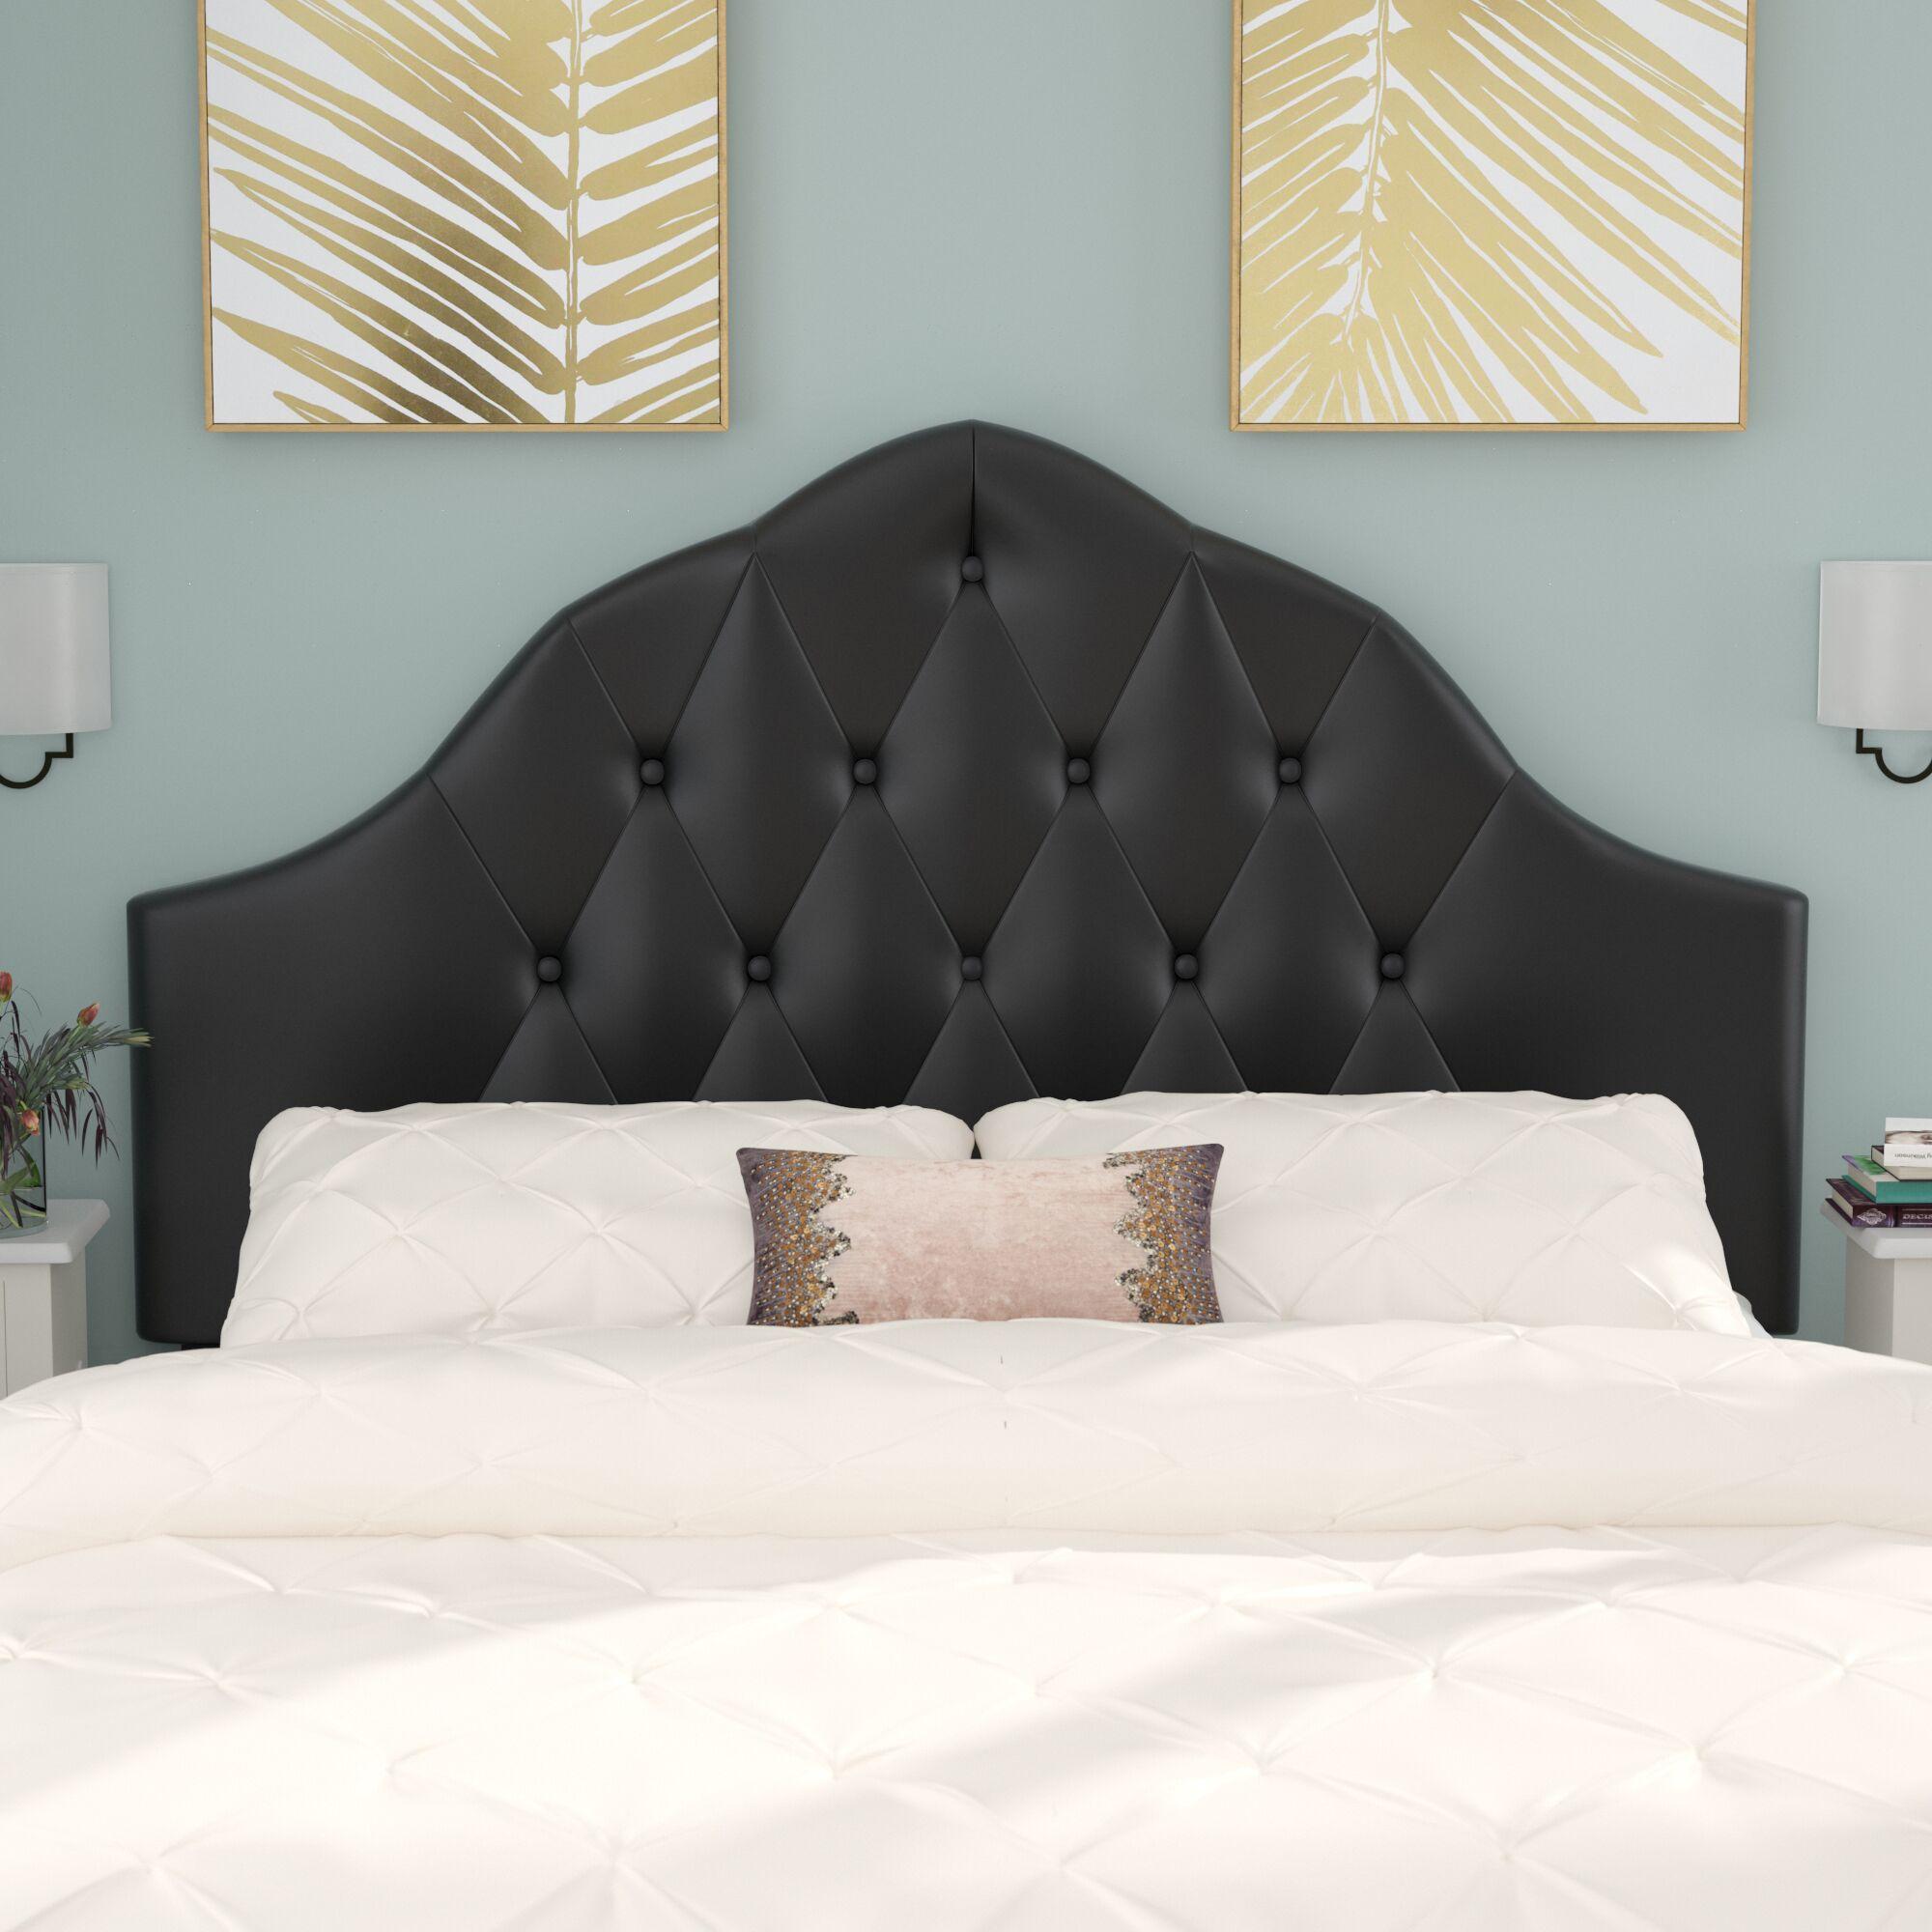 Joao Traditional Upholstered Panel Headboard Upholstery: Black, Size: Full